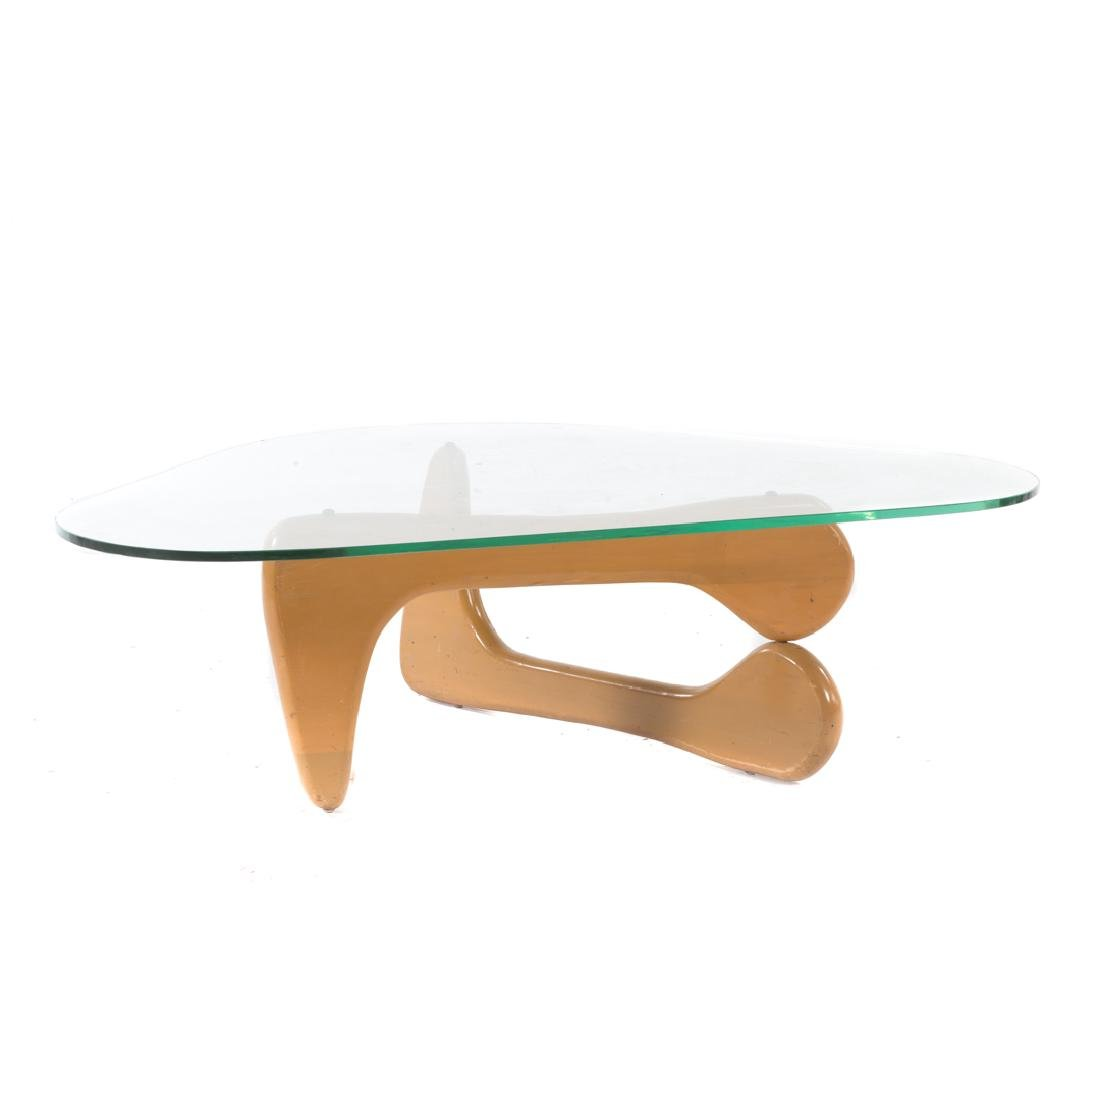 Isamu Noguchi IN-50 coffee table